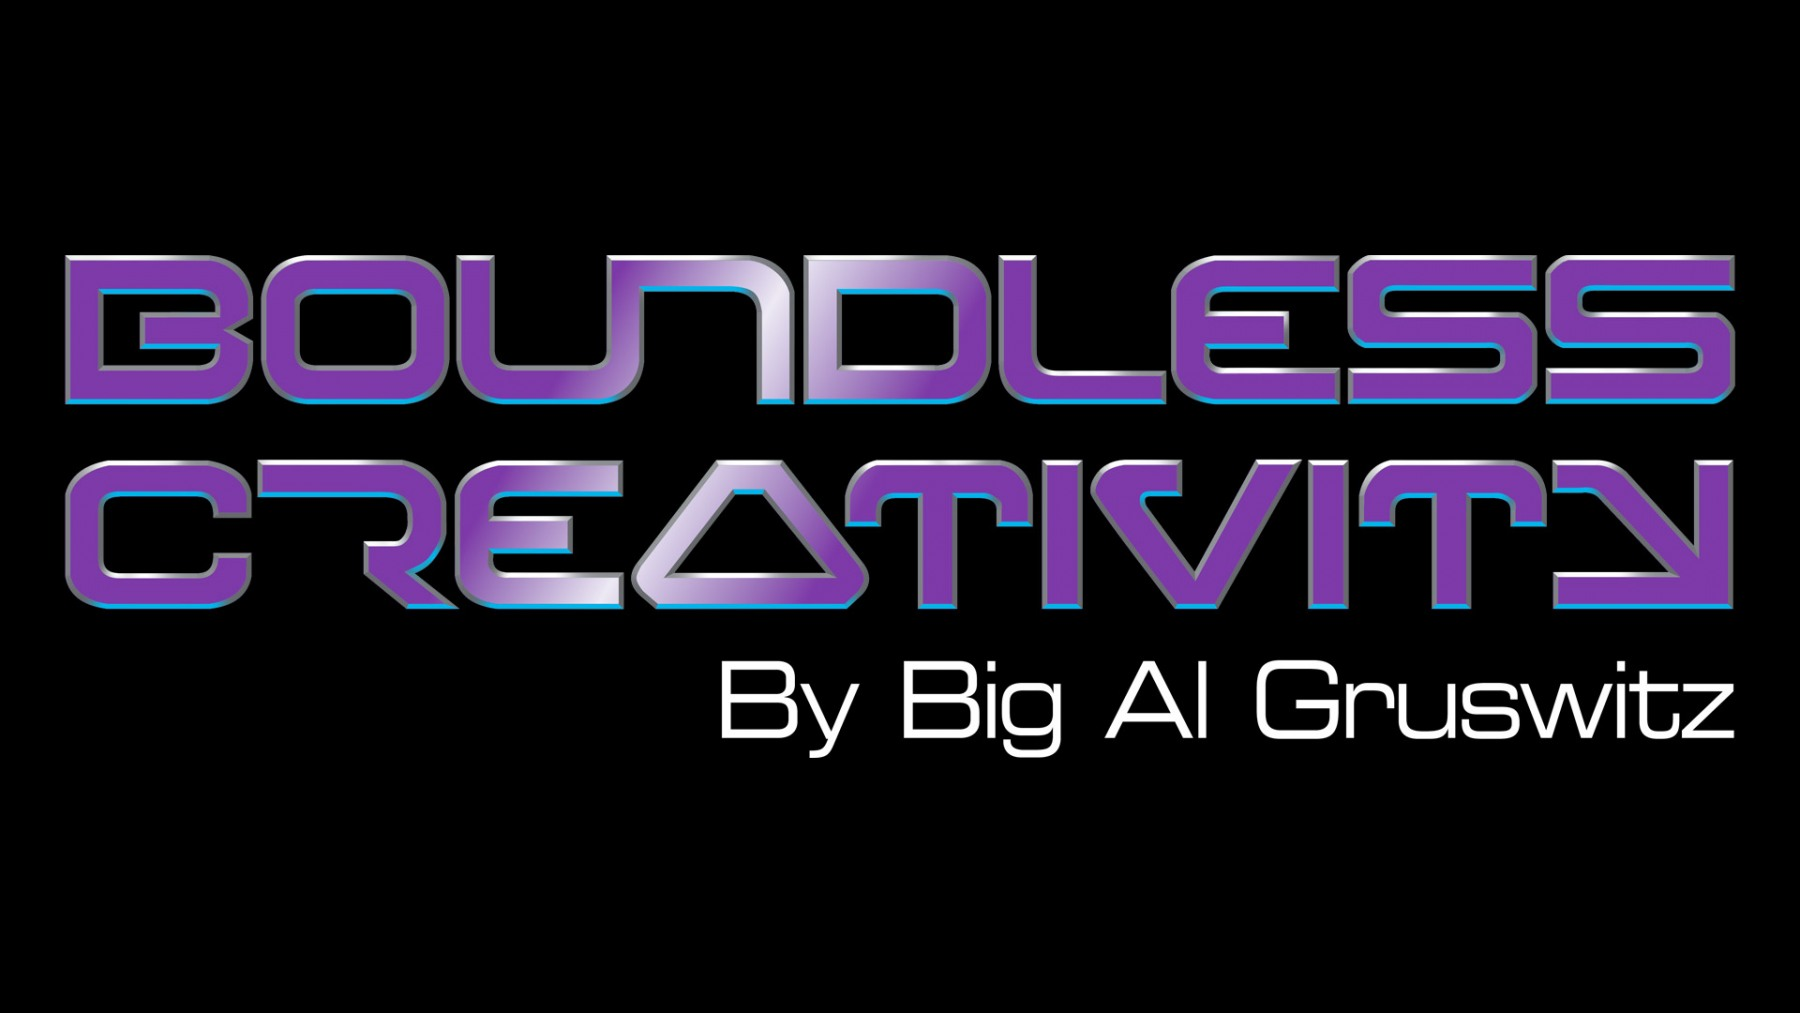 BOUNDLESS CREATIVITY LOGO